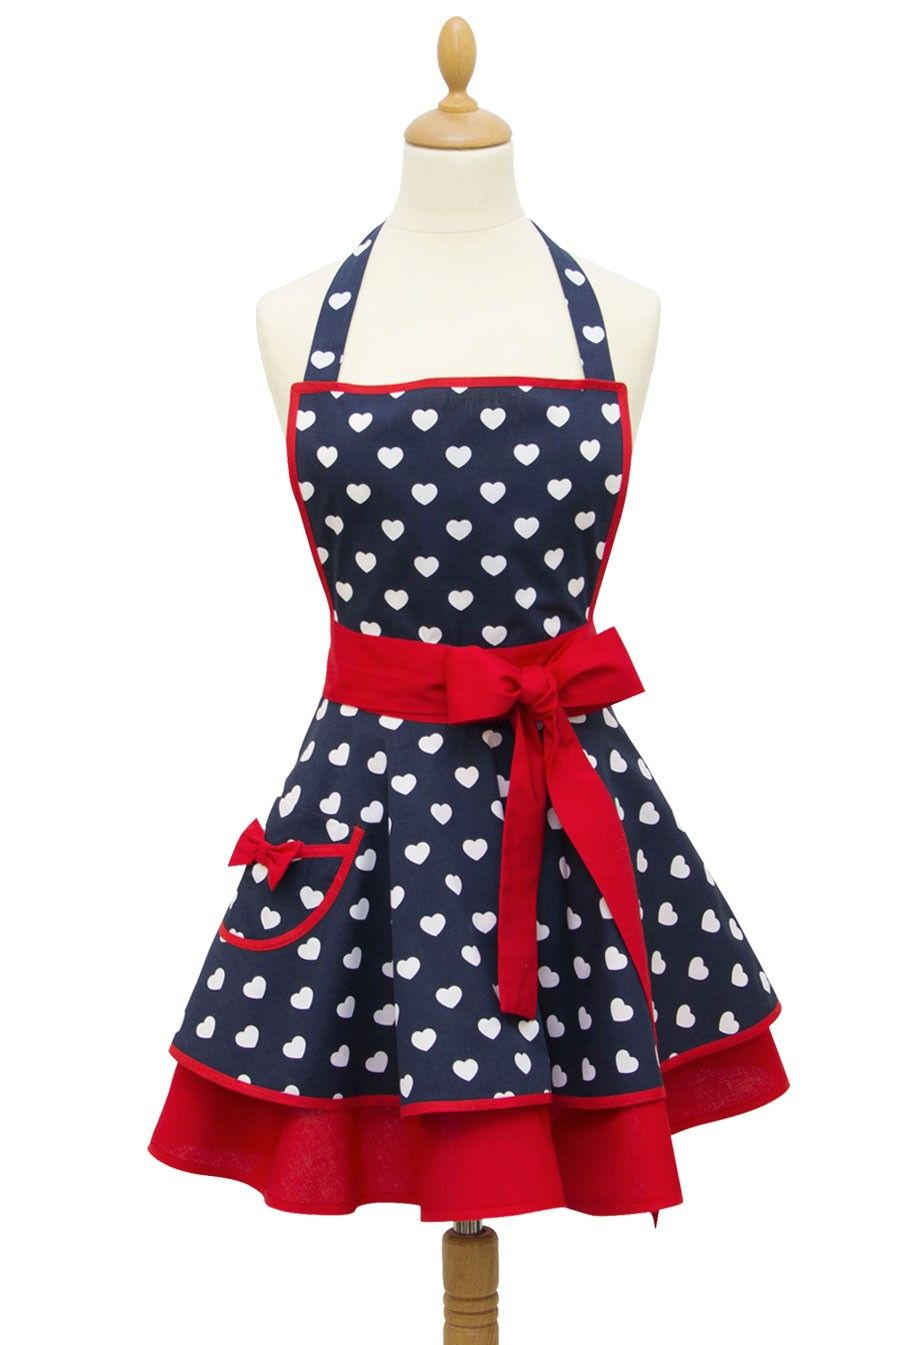 Madam Choup Les Cooking Dress Glamour Tablier Cuisine Tablier Tablier Vintage